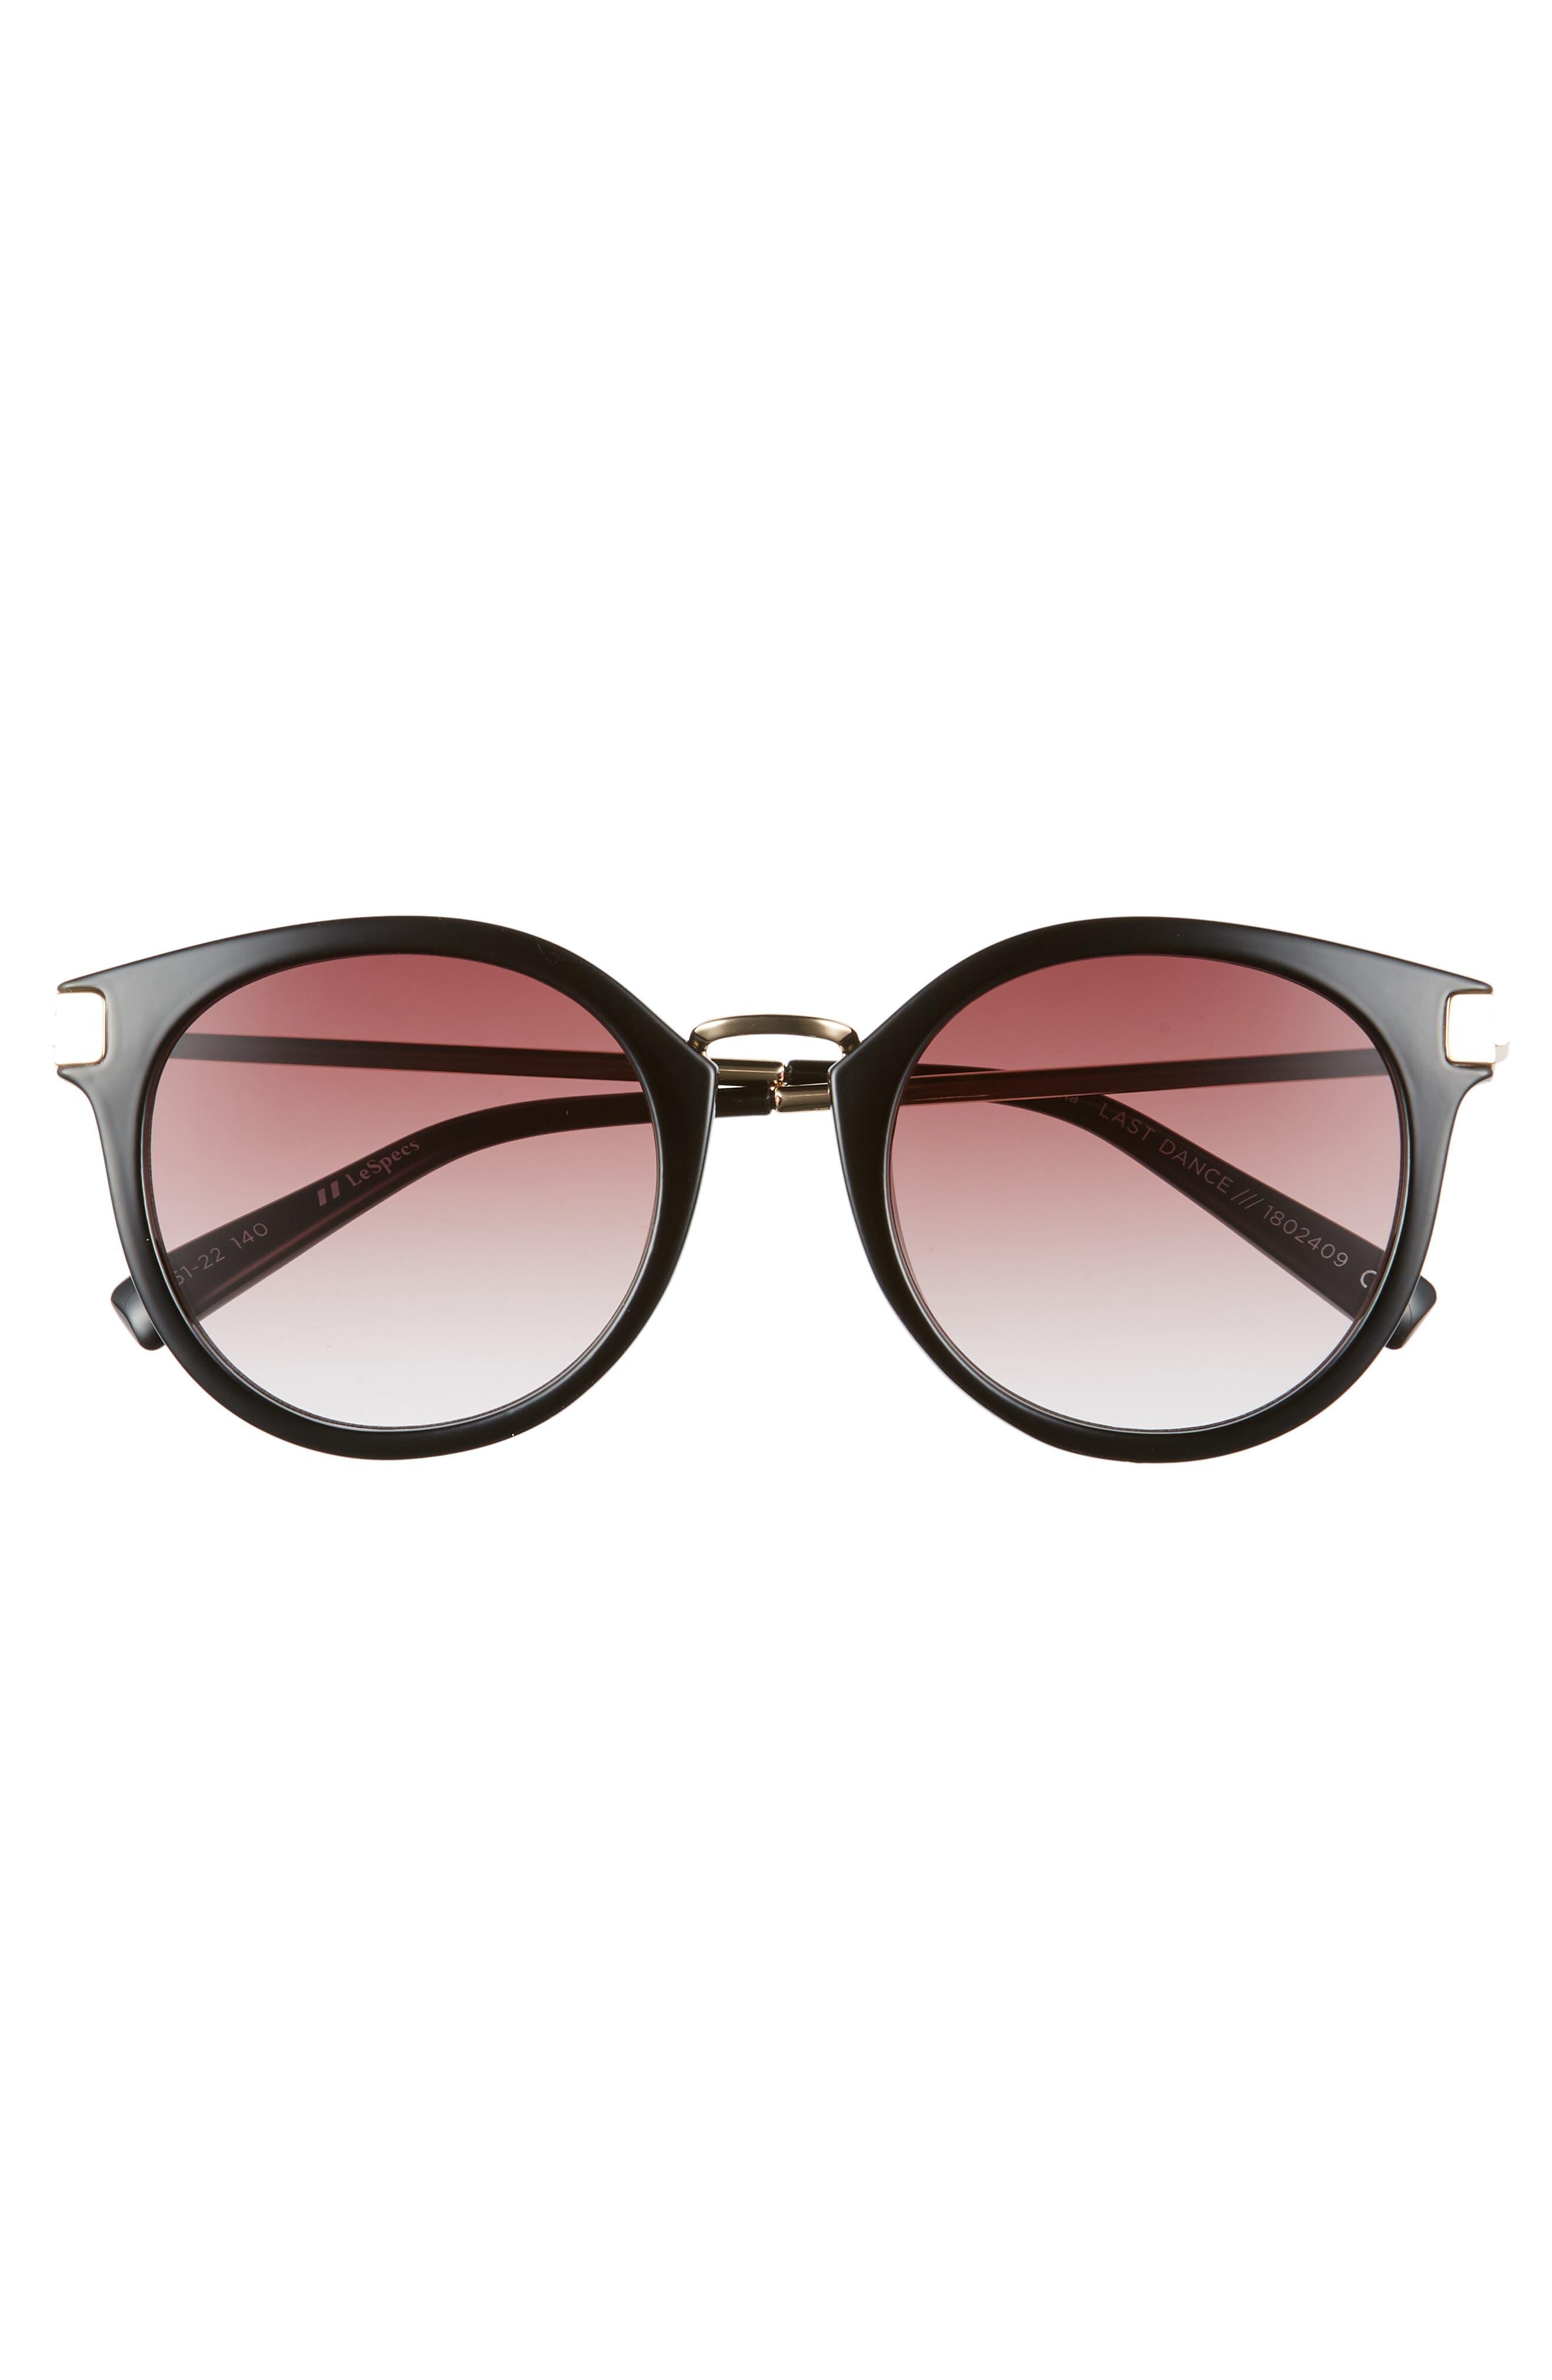 Last Dance 51mm Mirrored Round Sunglasses,                             Alternate thumbnail 3, color,                             BLACK